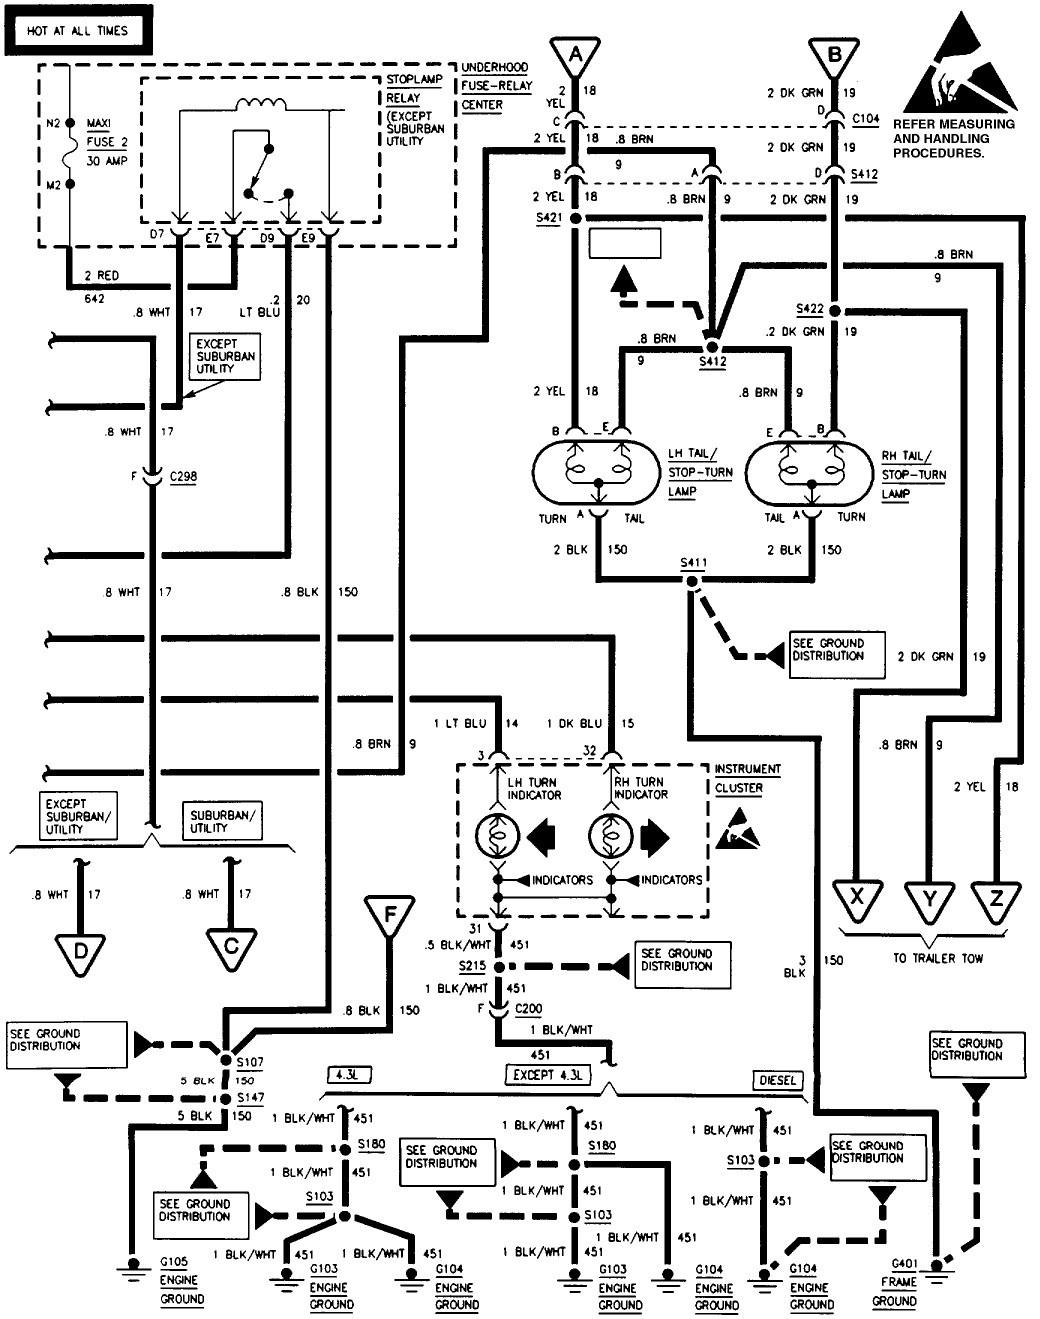 [DIAGRAM] Tail Light Wiring Diagram 98 Sierra FULL Version